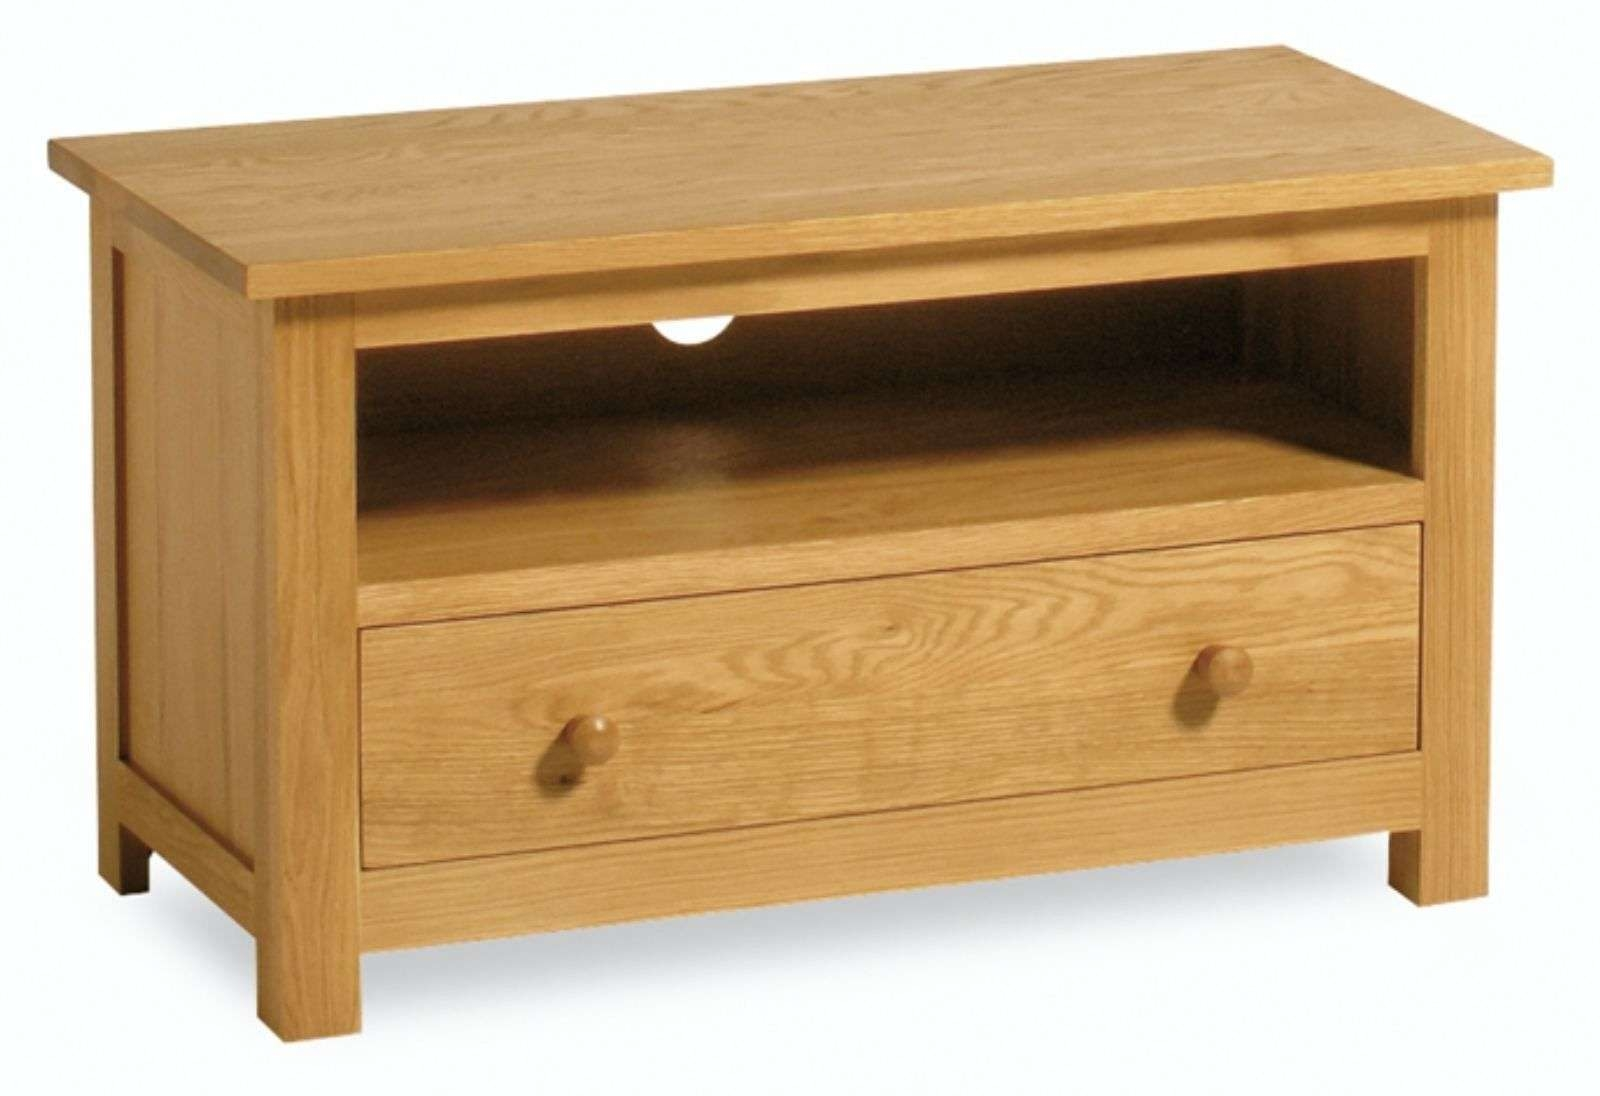 Penrose Oak Small Tv Stand / Modern Light Oak Tv Unit / Solid Wood Throughout Modern Oak Tv Stands (View 10 of 15)